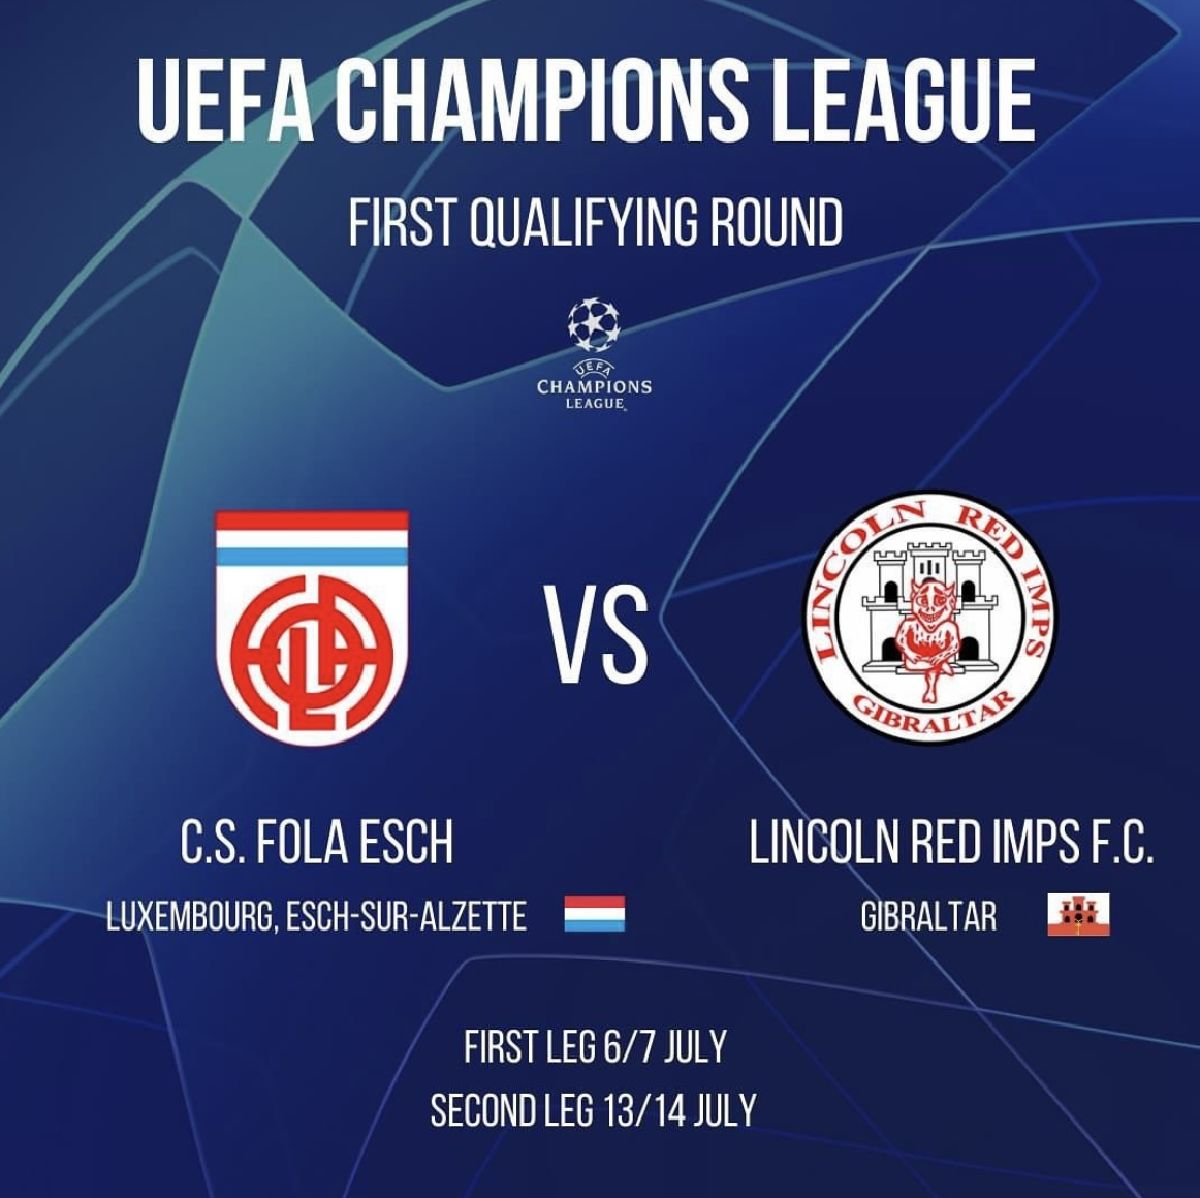 Uefa Champions League - CS Fola Esch vs Lincoln Red Imps